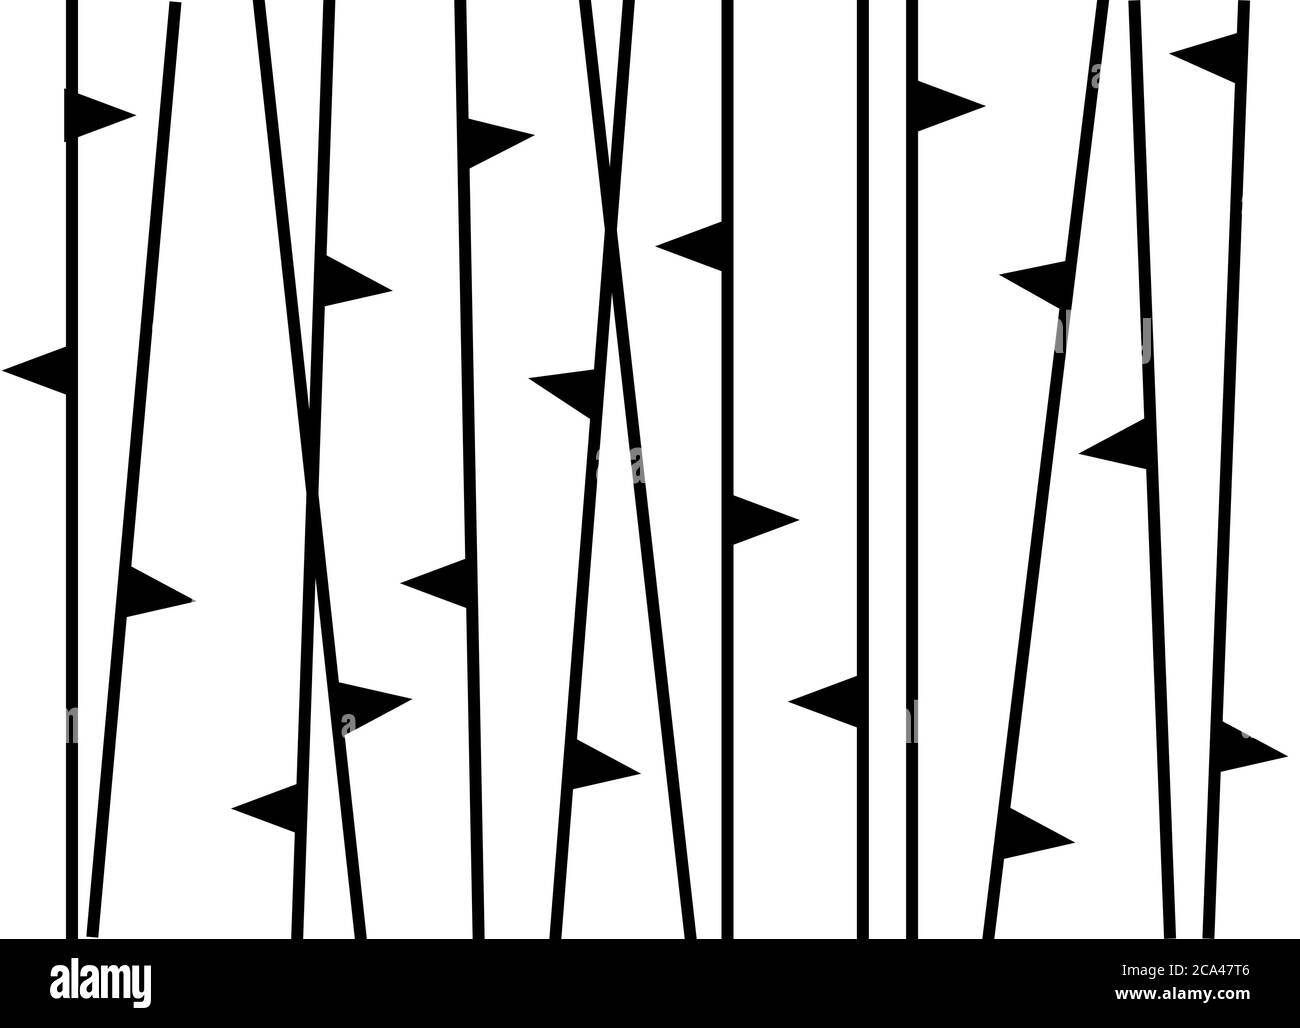 Black And White Abstract Minimalist Trees Illustration Minimalist Fabric Design Stock Photo Alamy